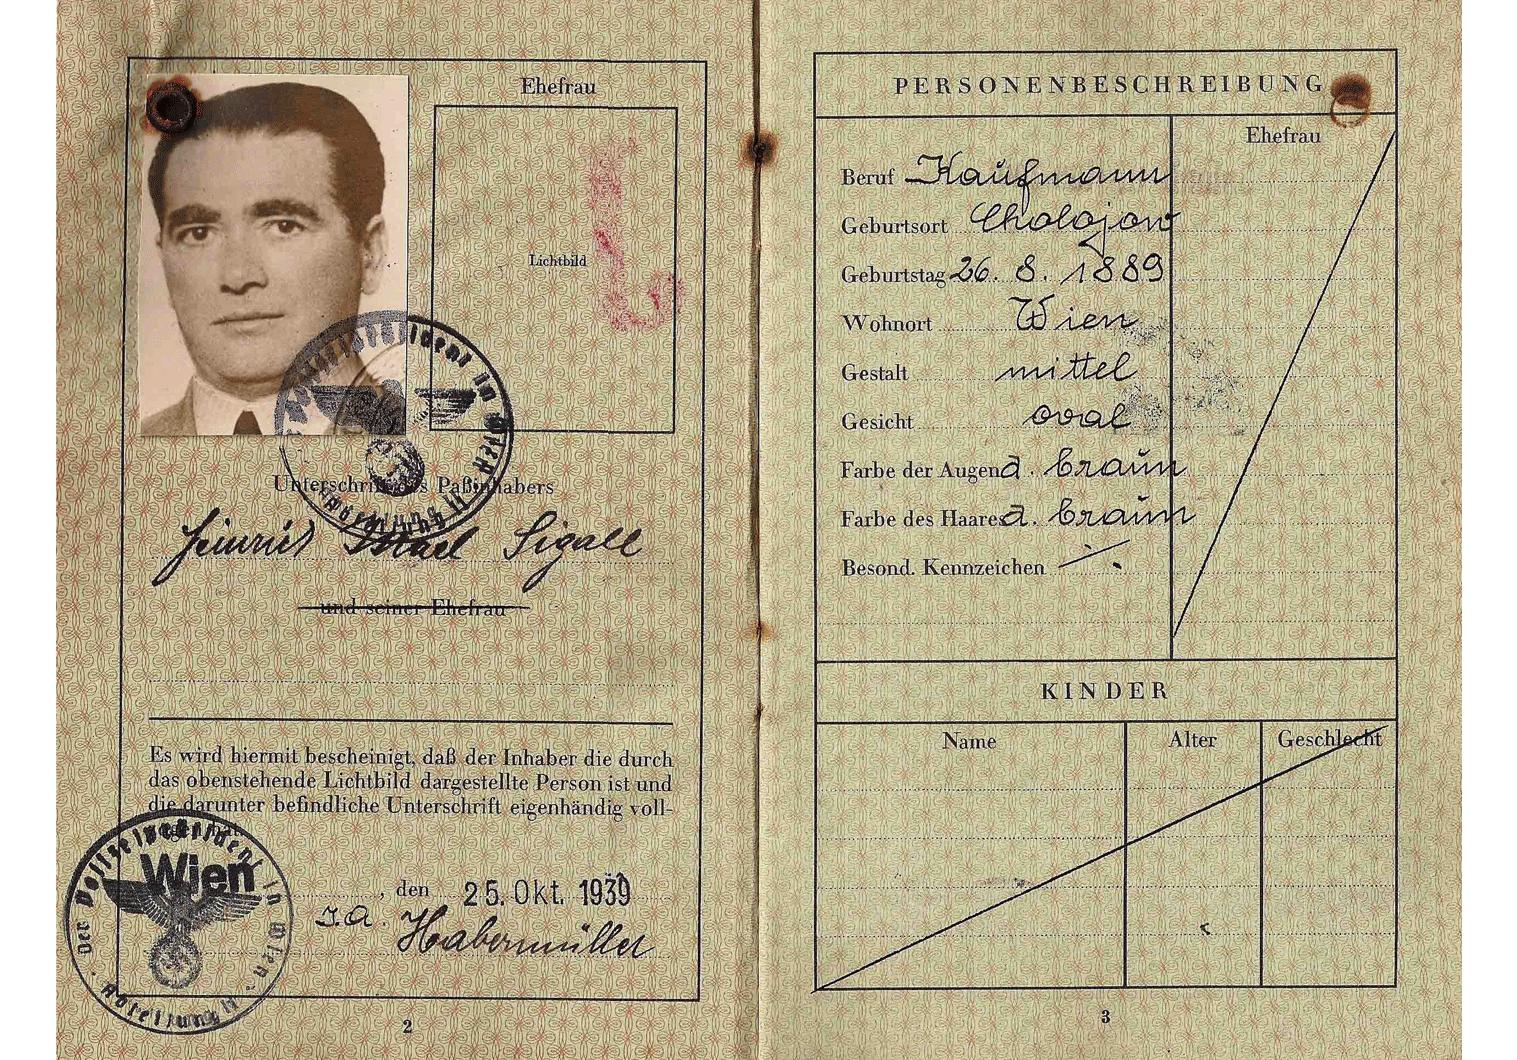 J stamped German passport